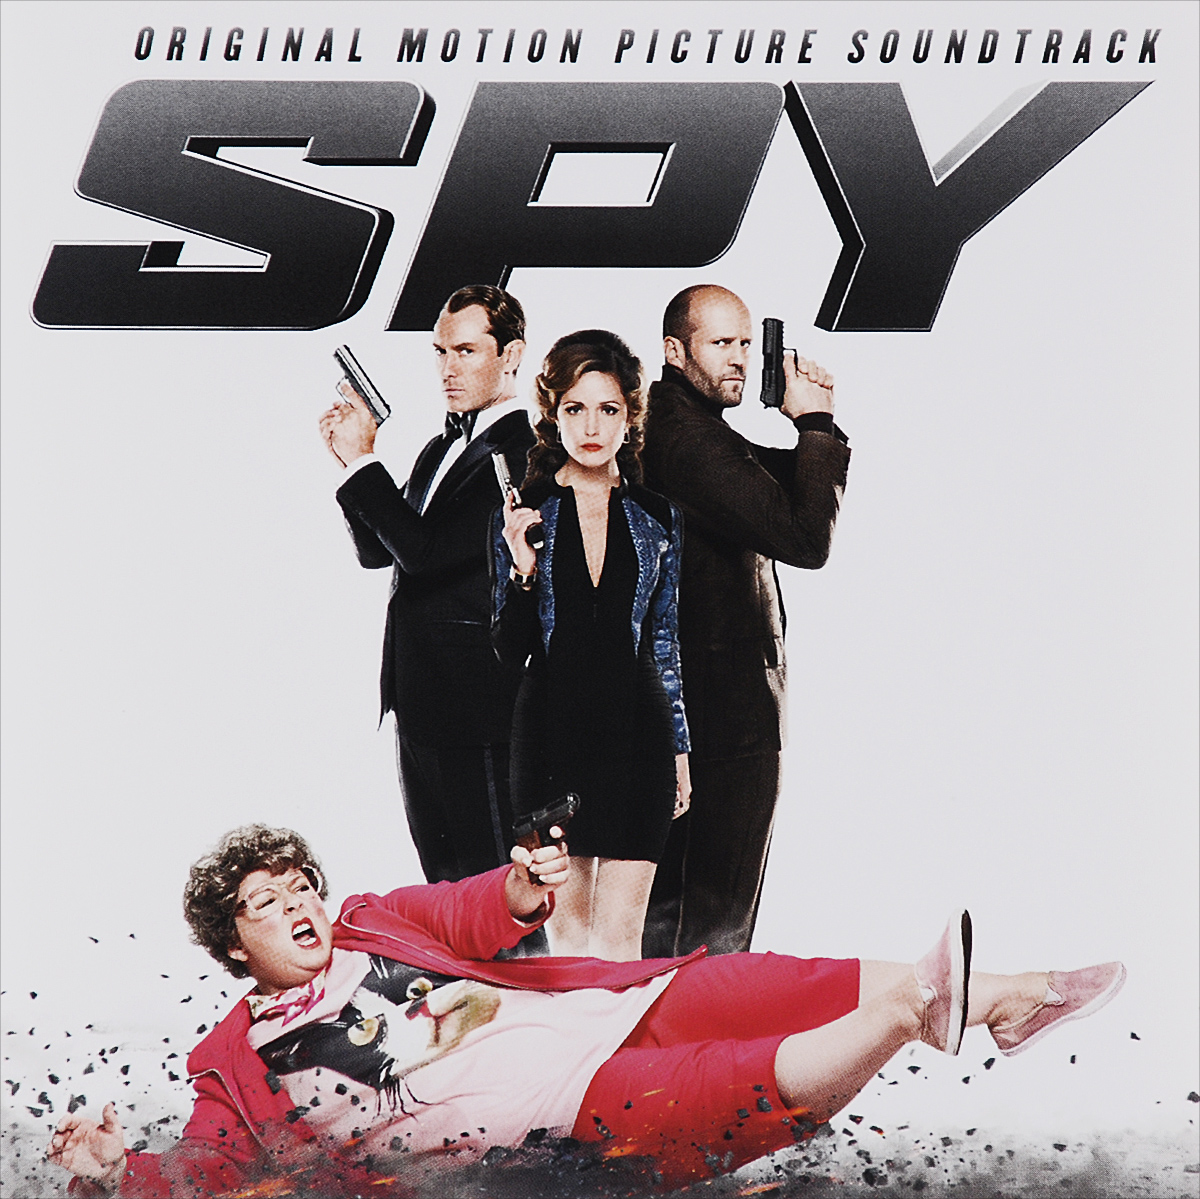 Spy. Original Motion Picture Soundtrack